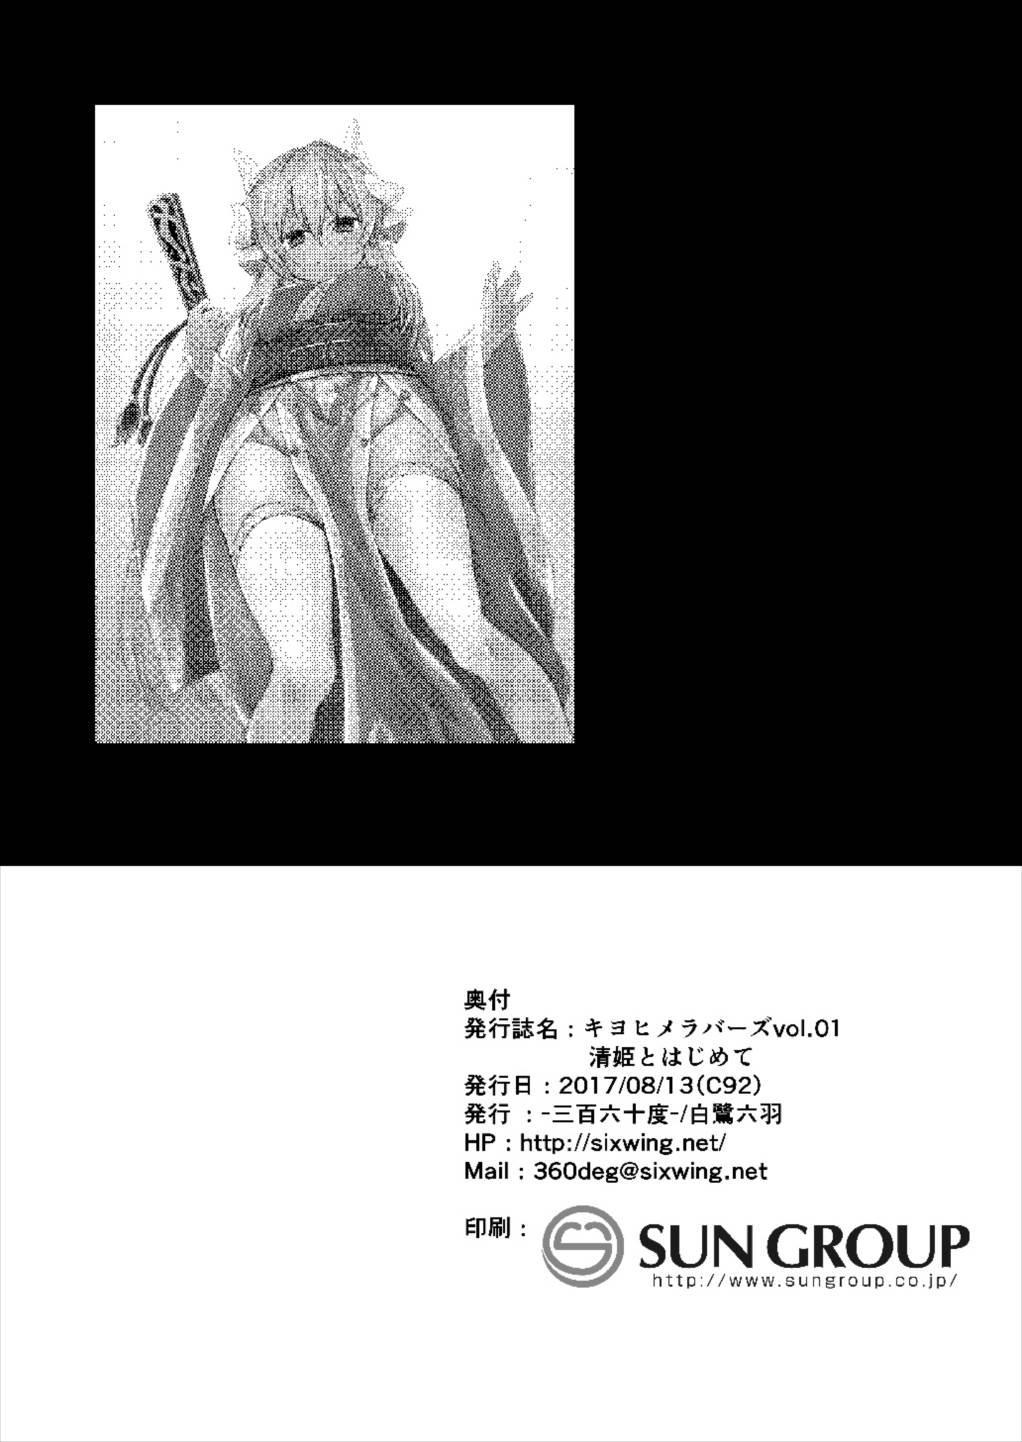 Kiyohime Lovers Vol. 01 - Kiyohime to Hajimete 21